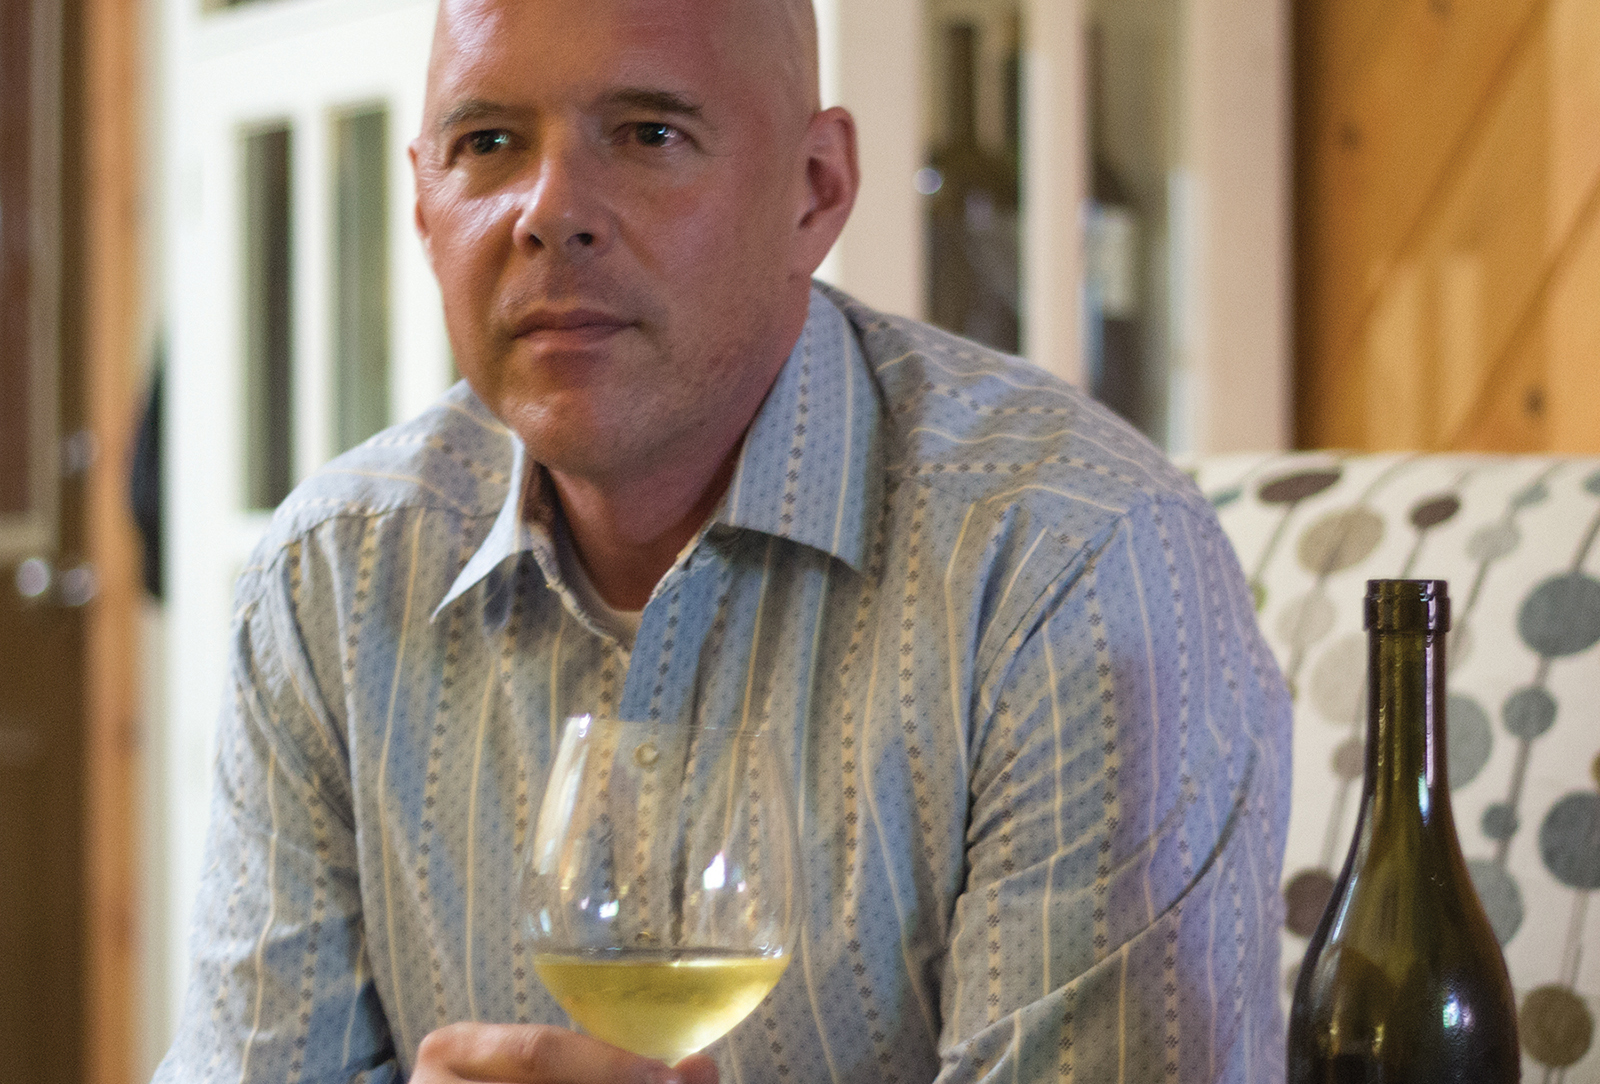 curt-christiansen-wine-navigator-highlands-nc